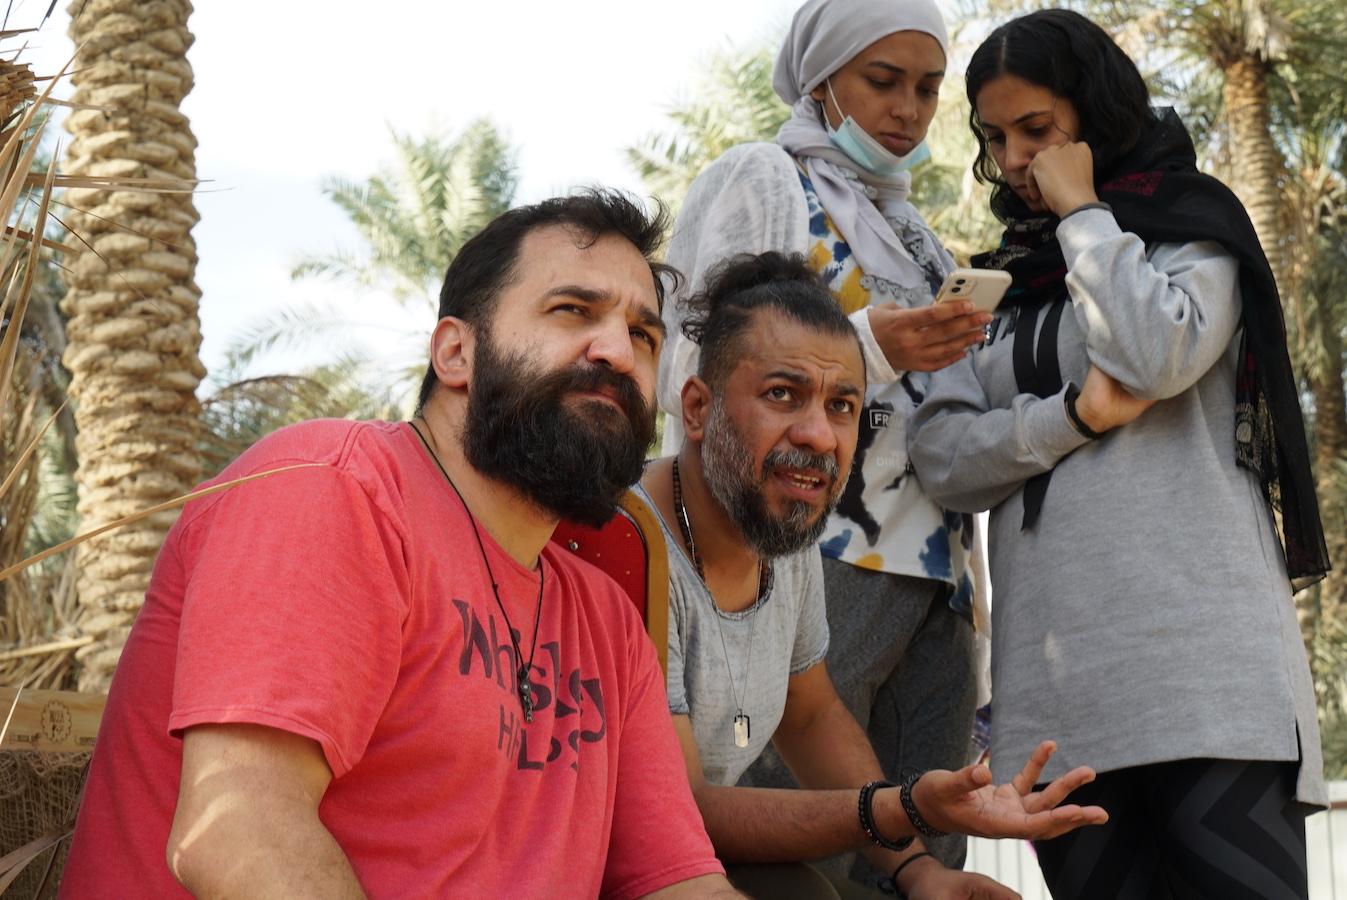 Arabian apocalypse: Inside a live-streamed Saudi horror movie - The Daily Podium